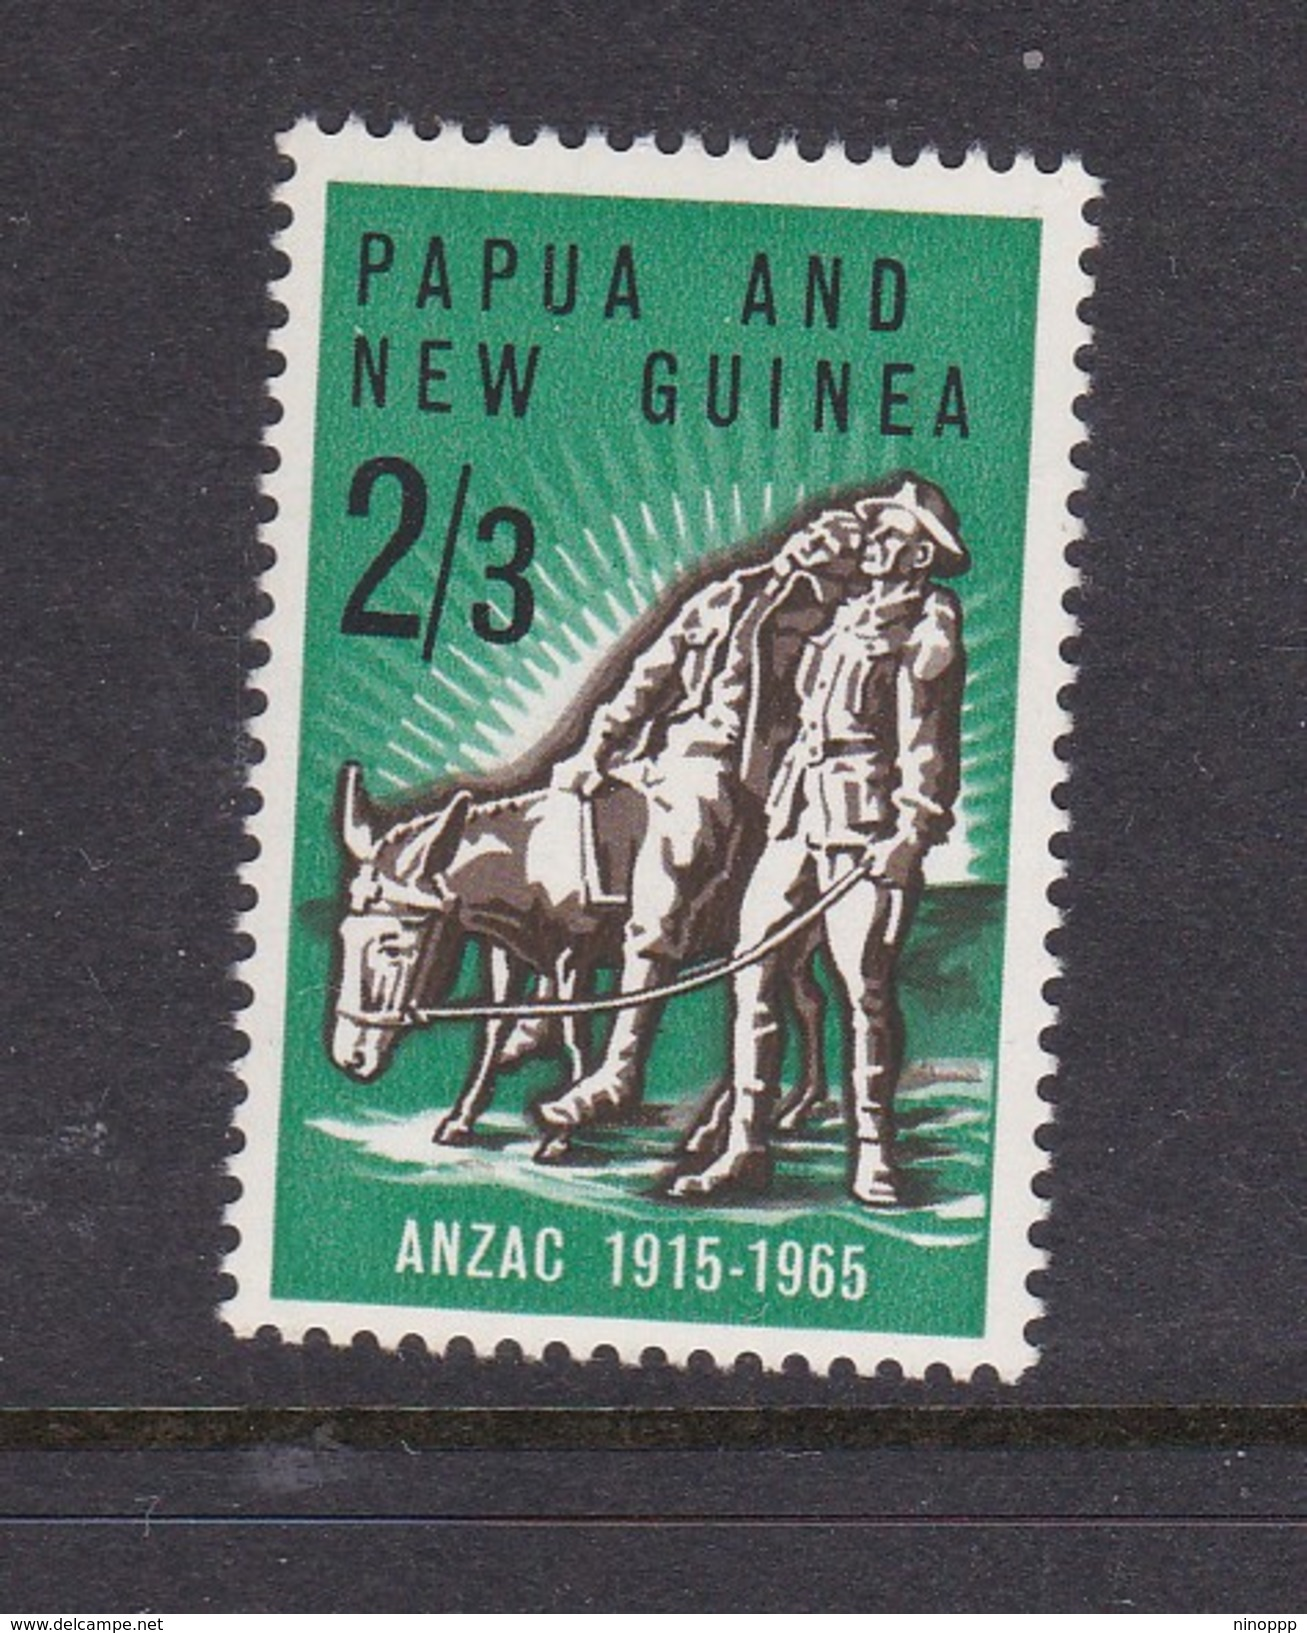 Papua New Guinea SG 76 1965 50th Anniversary Of Gallipoli Landing Mint Never Hinged - Papua New Guinea